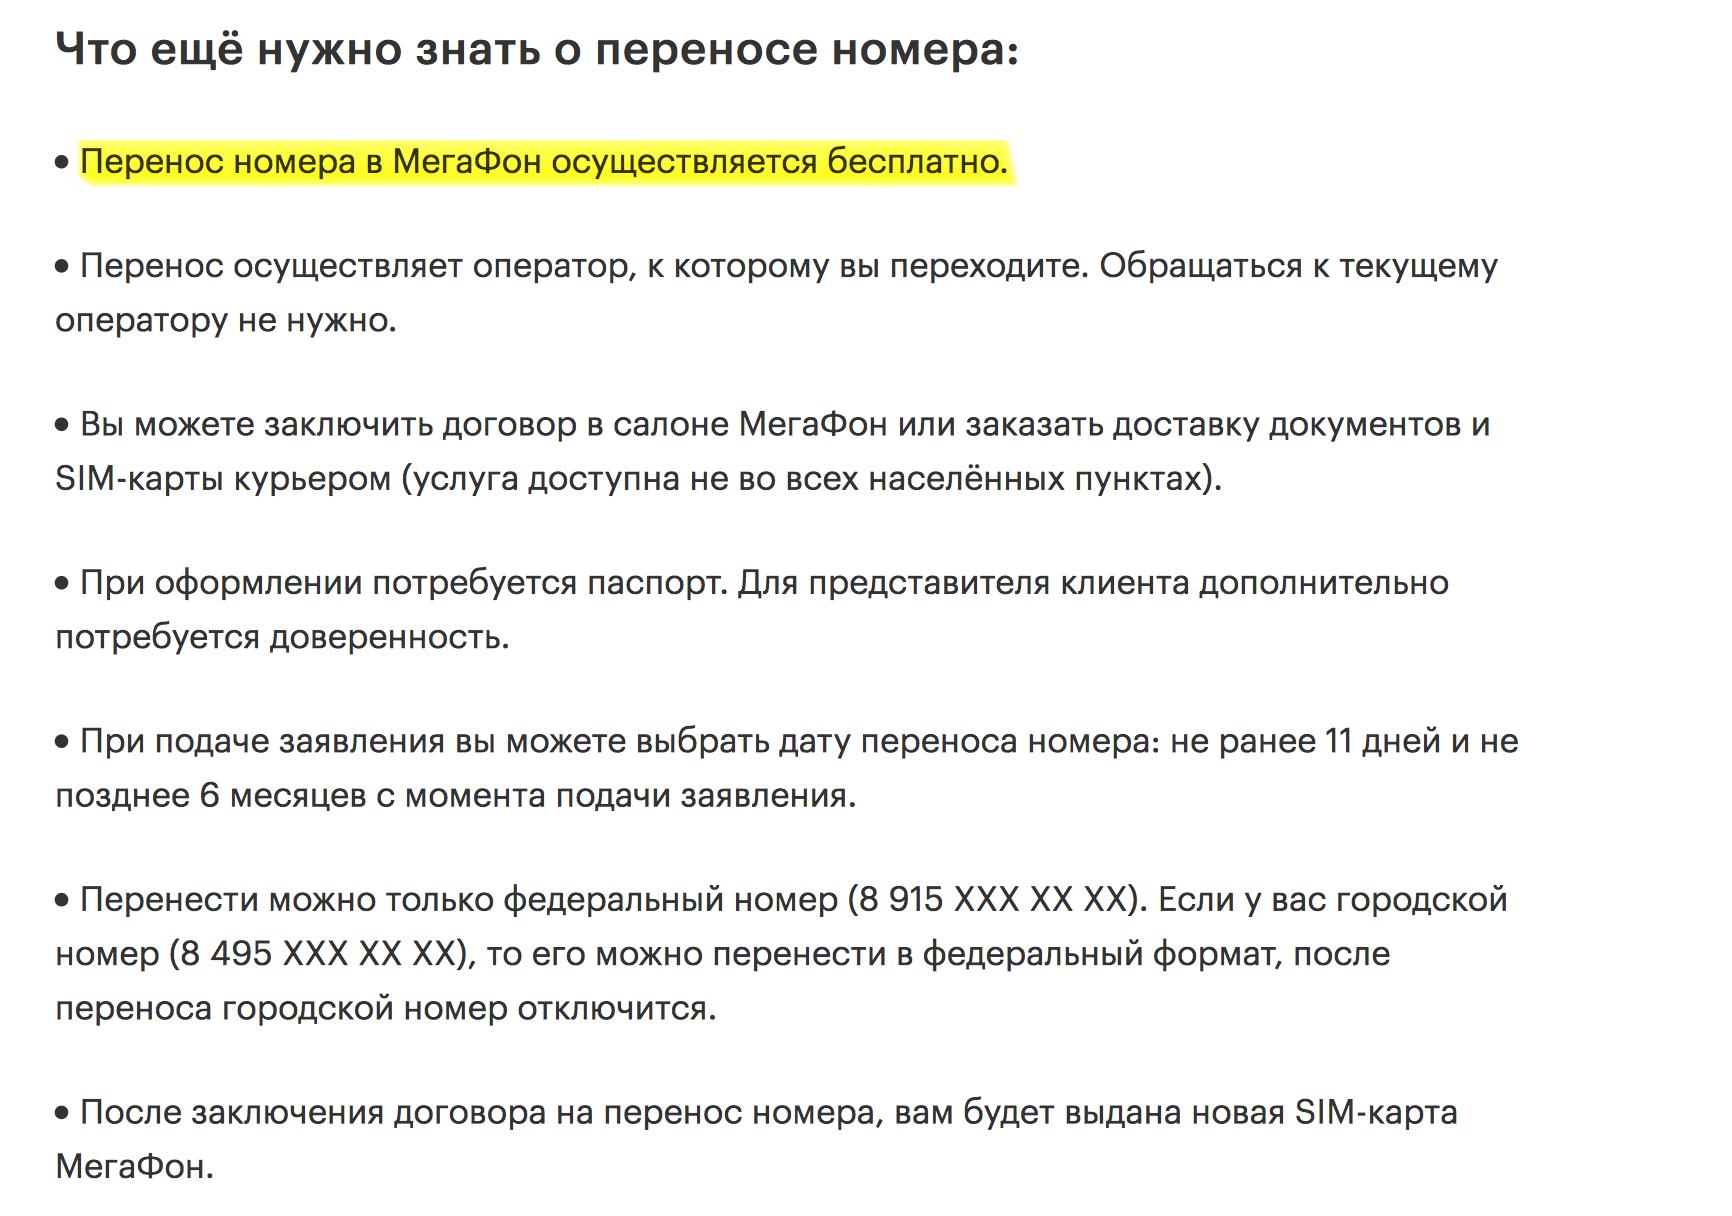 kak-sohranit-nomer-pri-smene-operatora-2